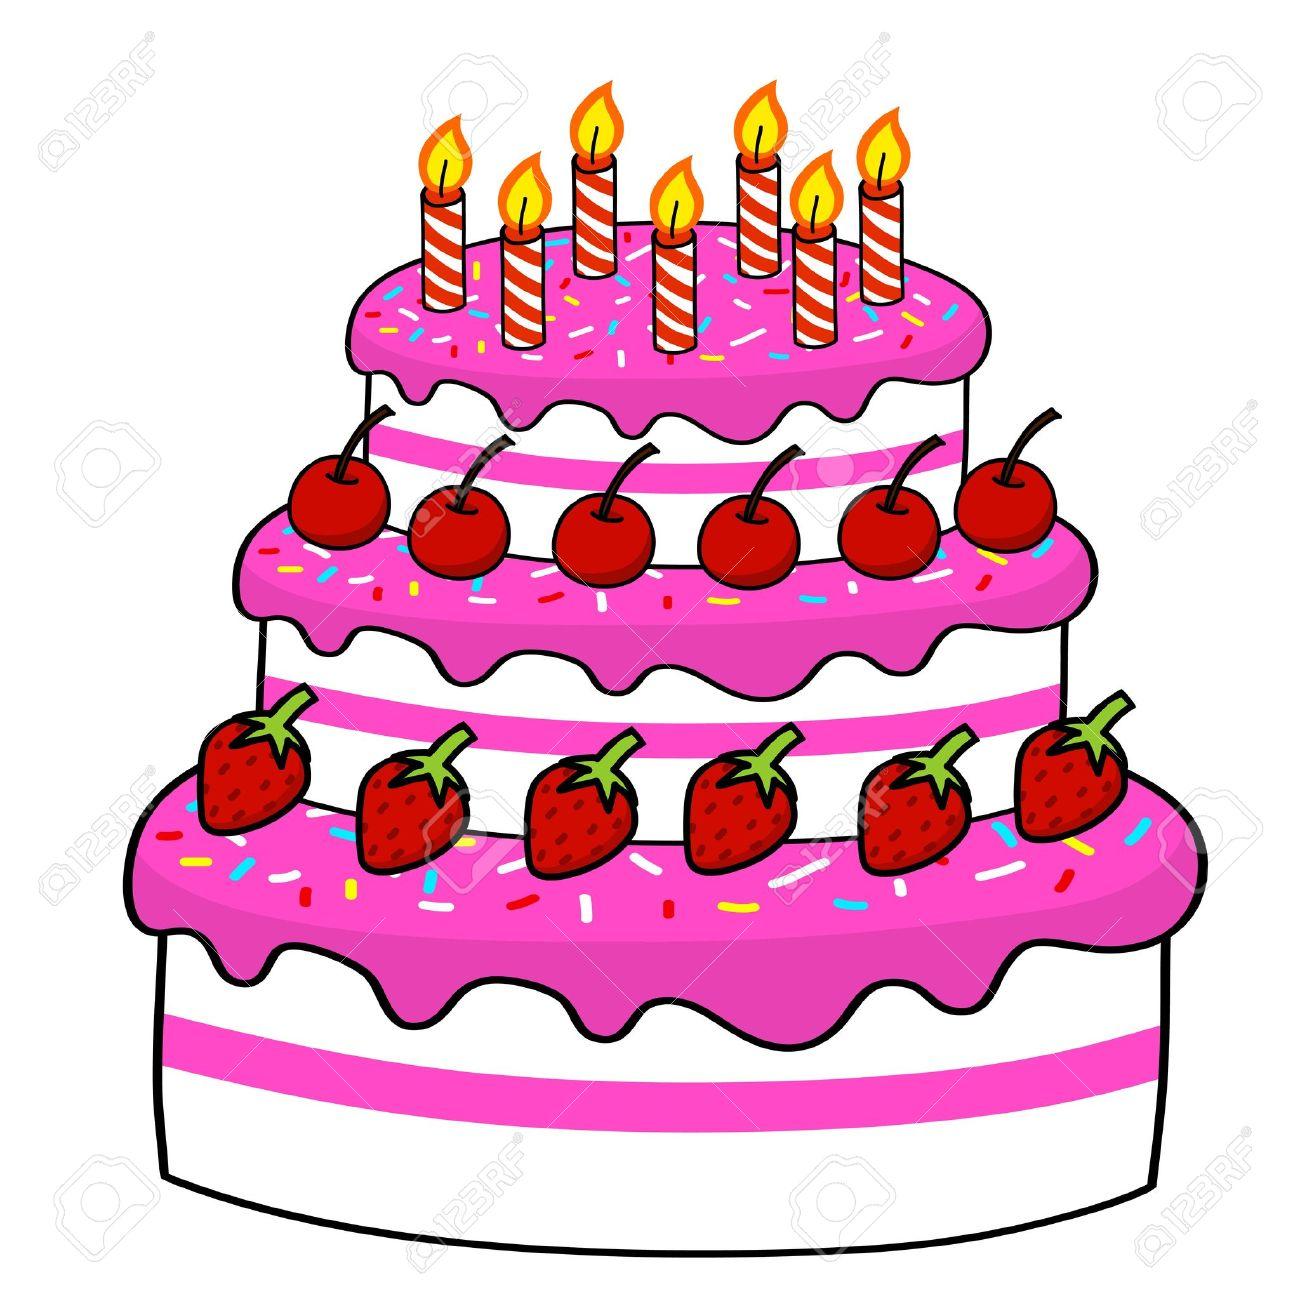 Cartoon Cake Hand Drawing Vector Royalty Free Cliparts Vectors And